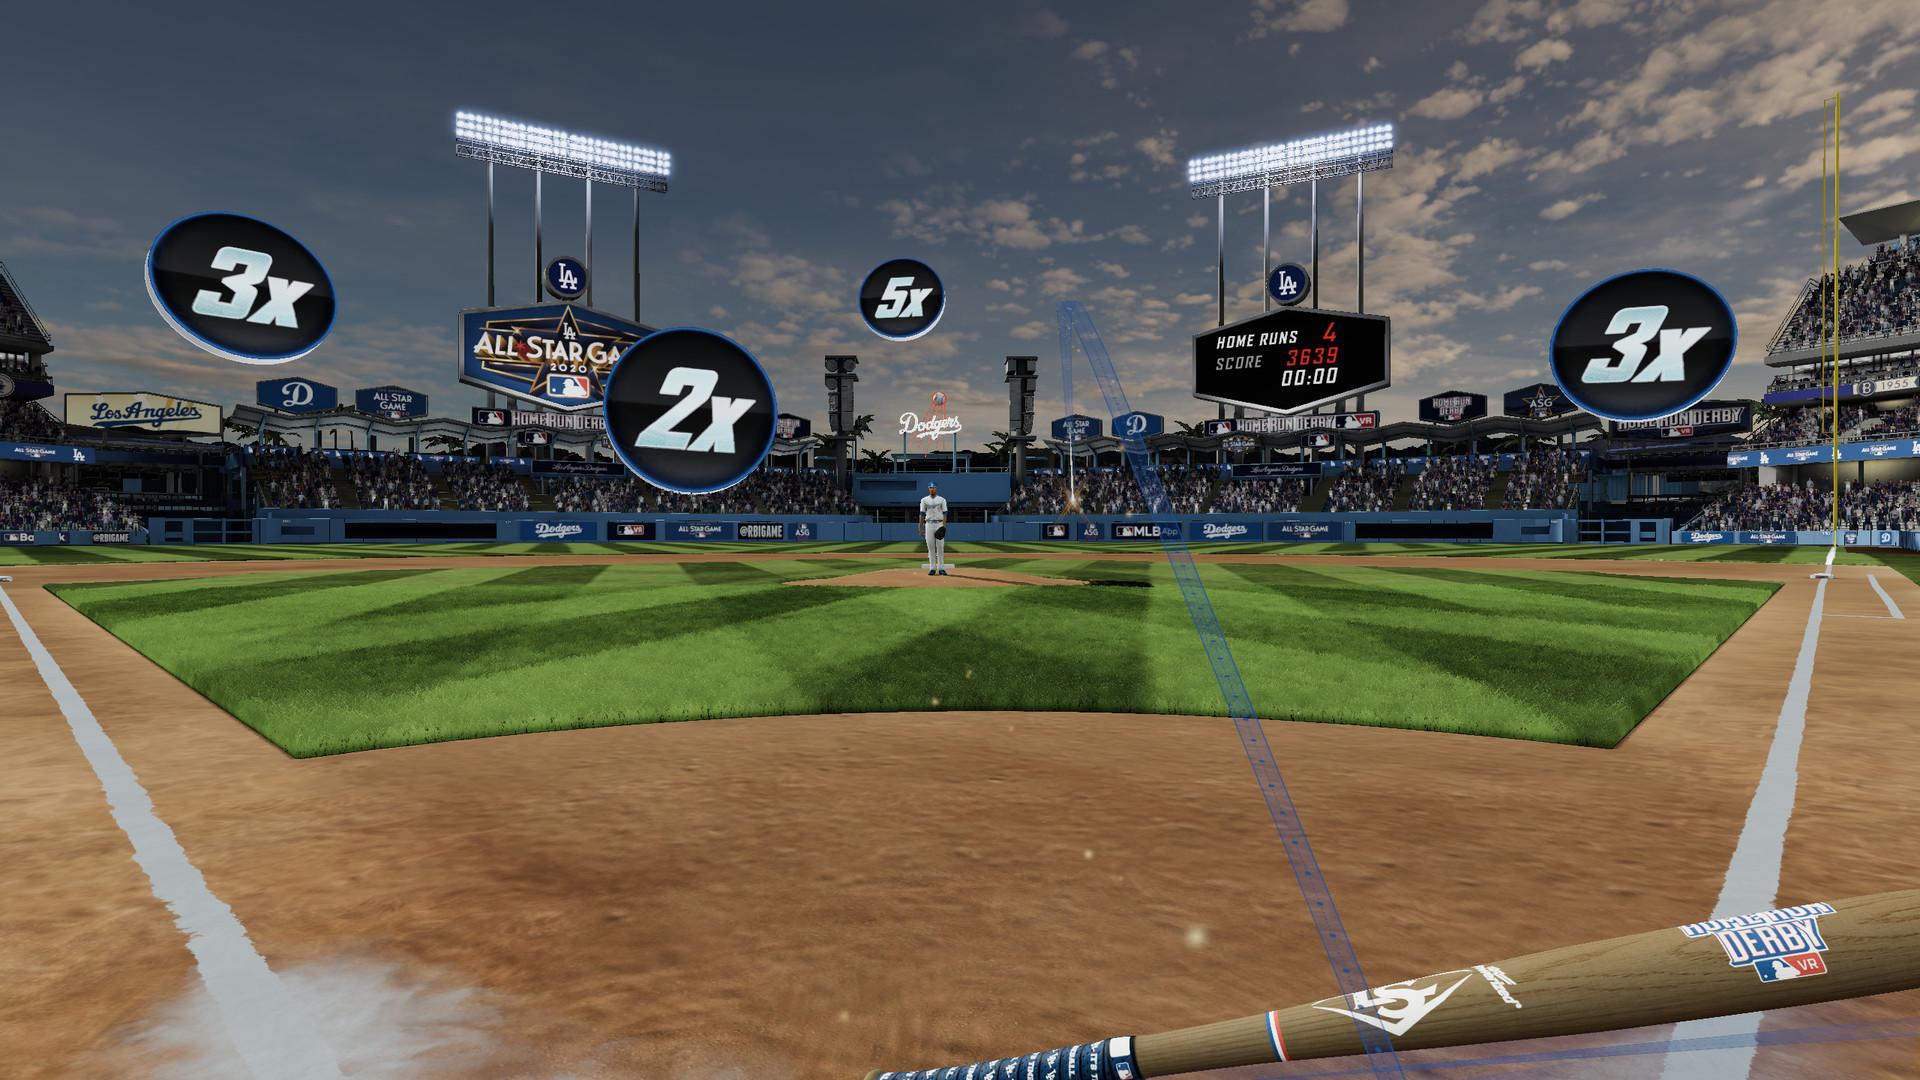 Oculus Quest 游戏《MLB Home Run Derby VR!》美国职棒大联盟本垒打 VR插图(2)